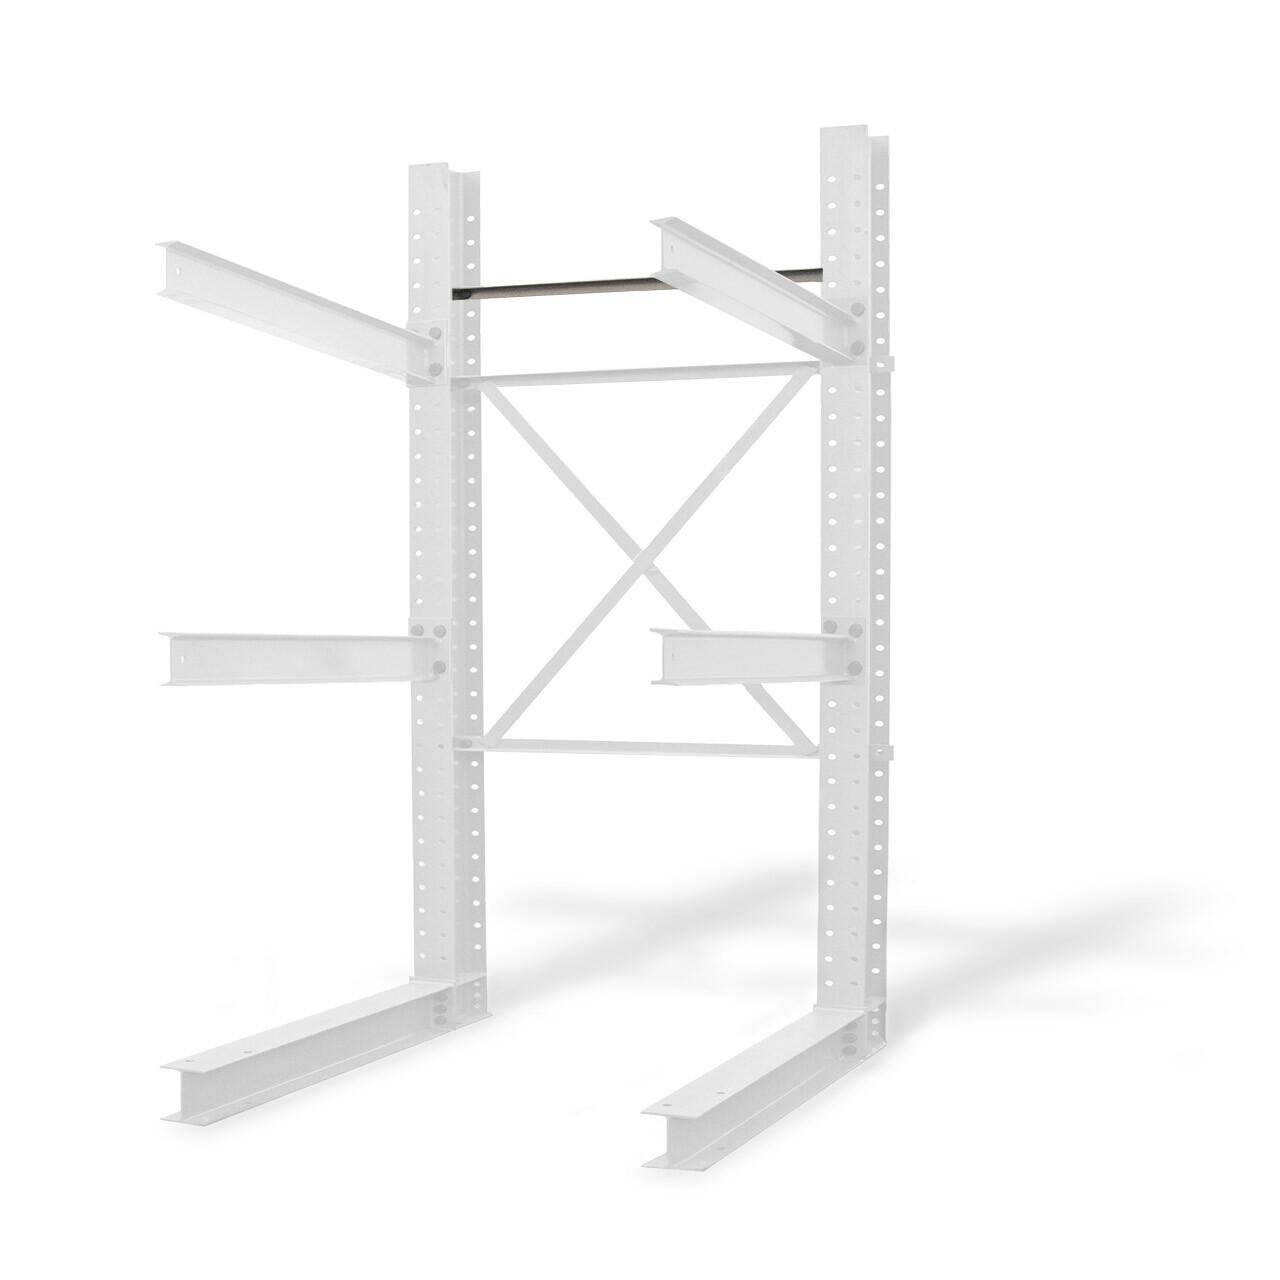 Cantilever racking horizontal brace